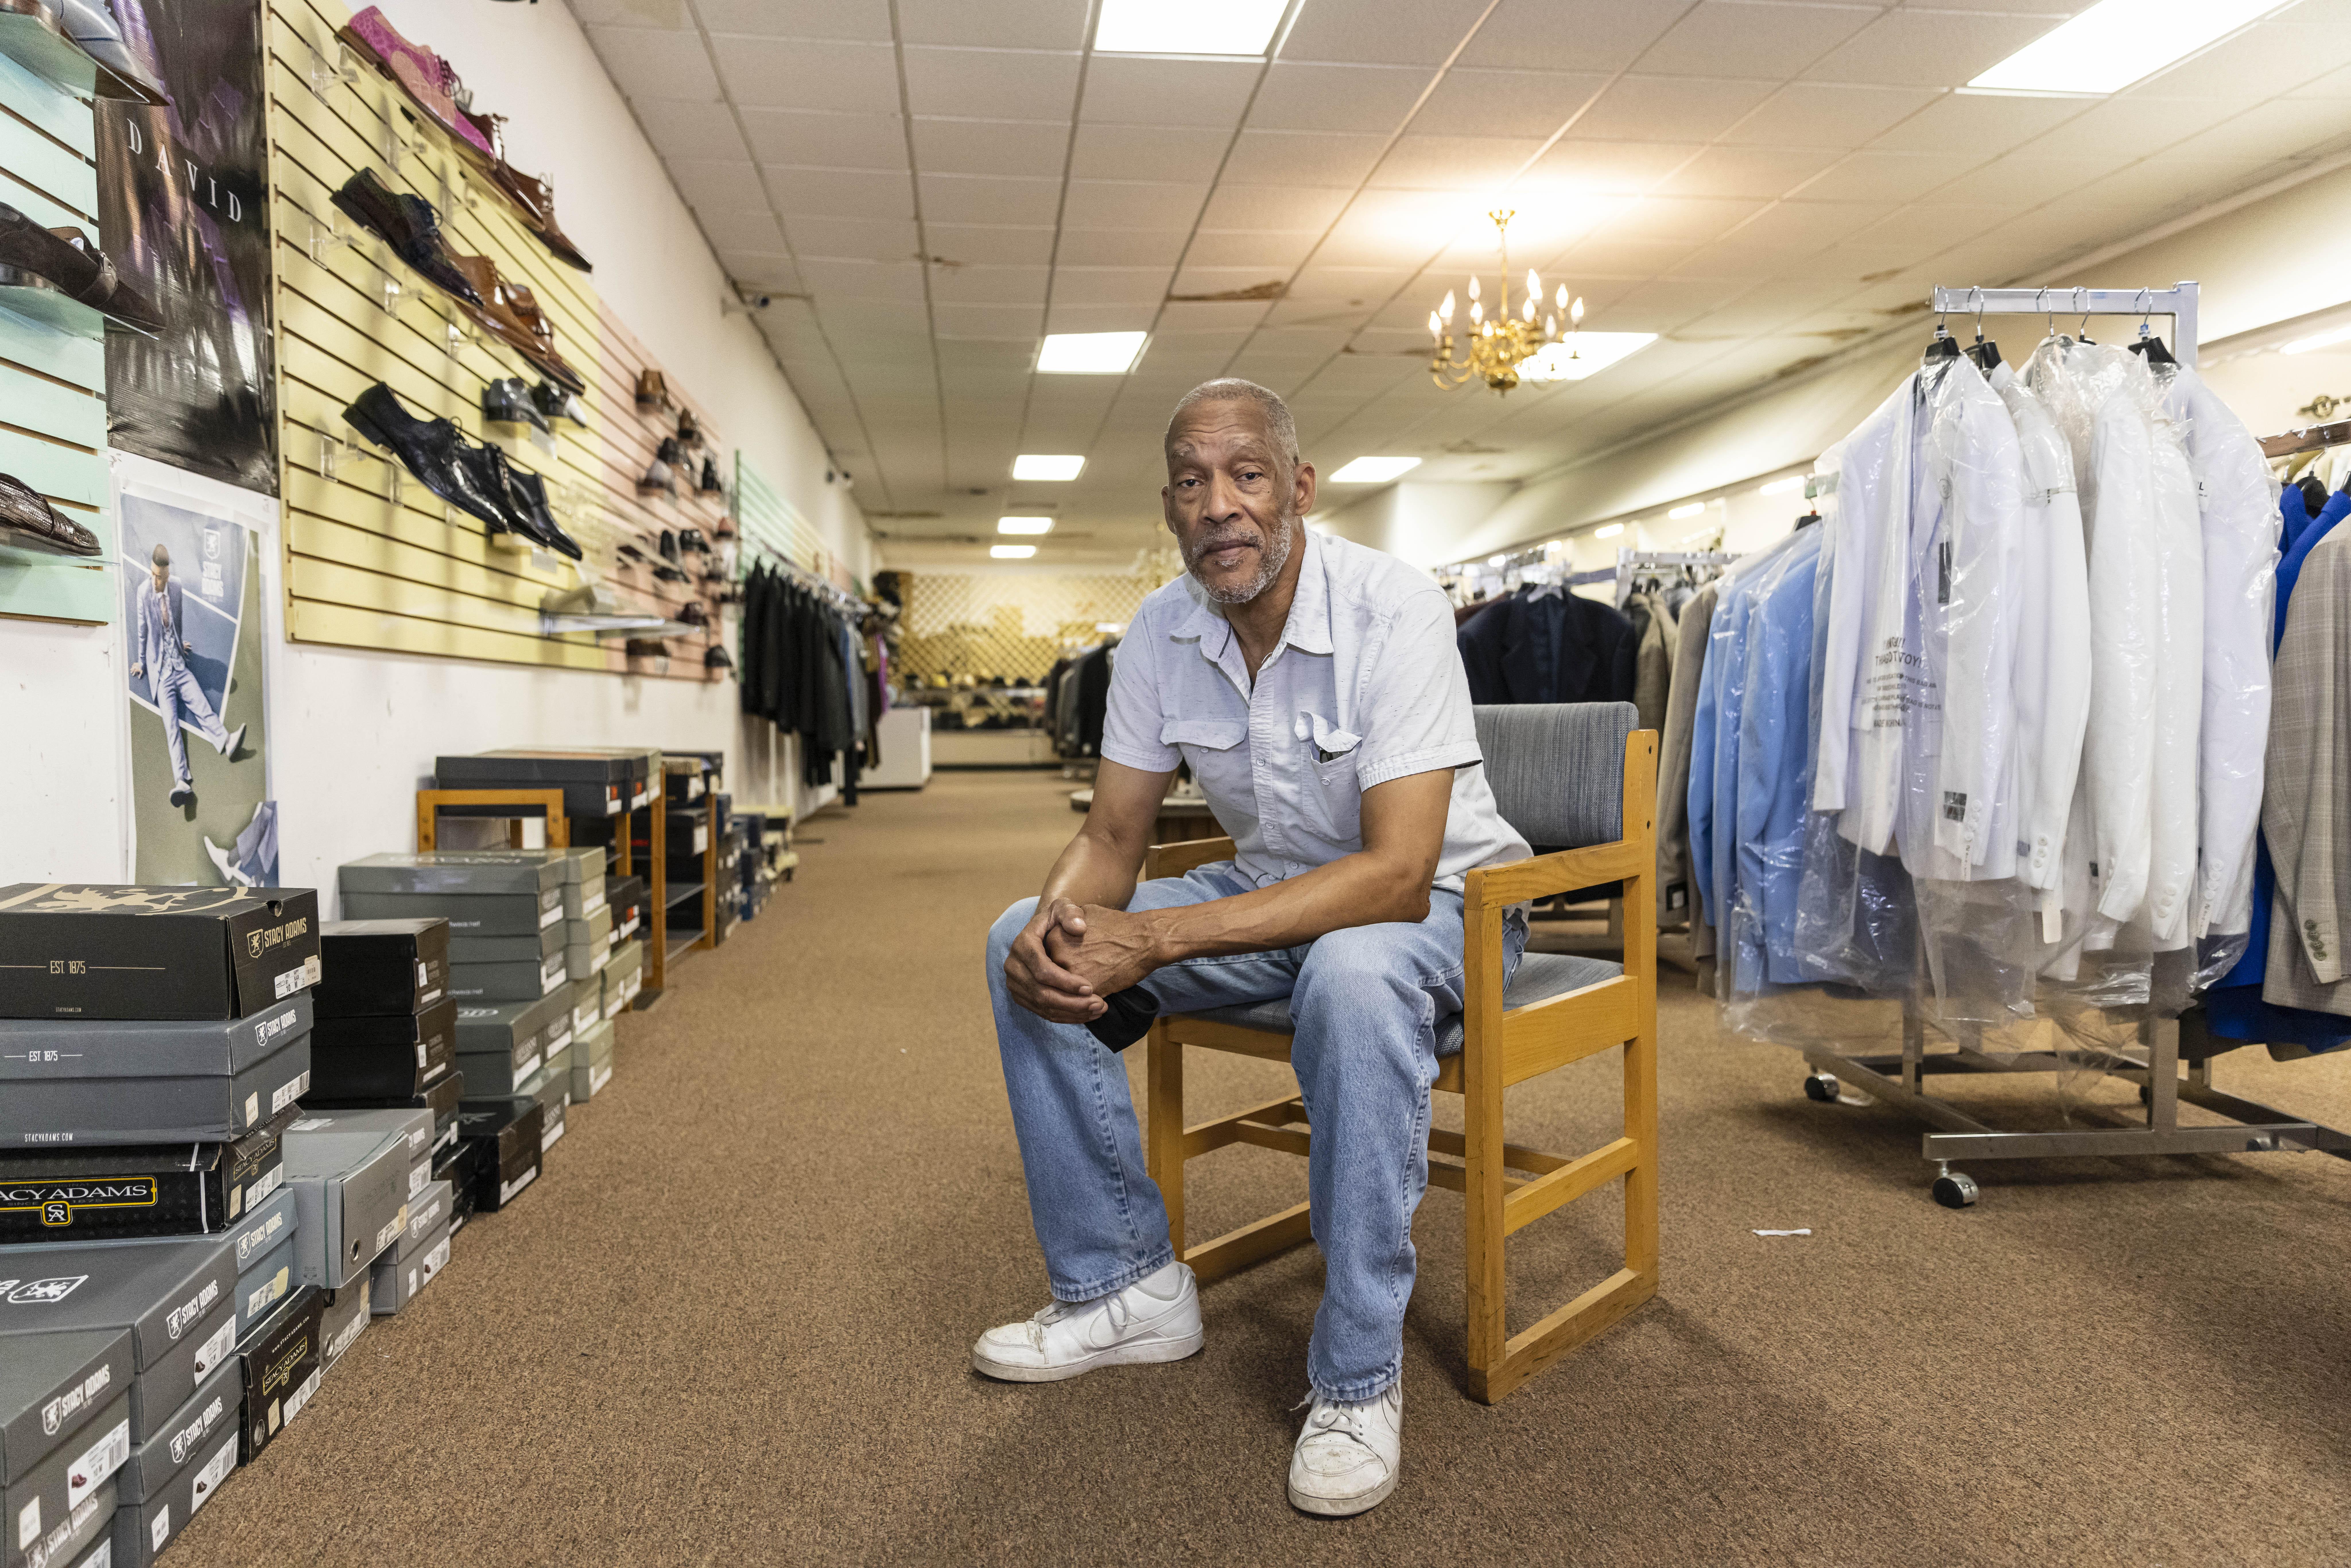 Ledall Edwards at his Edwards Fashion store, 11363 S. Michigan Ave., Roseland.